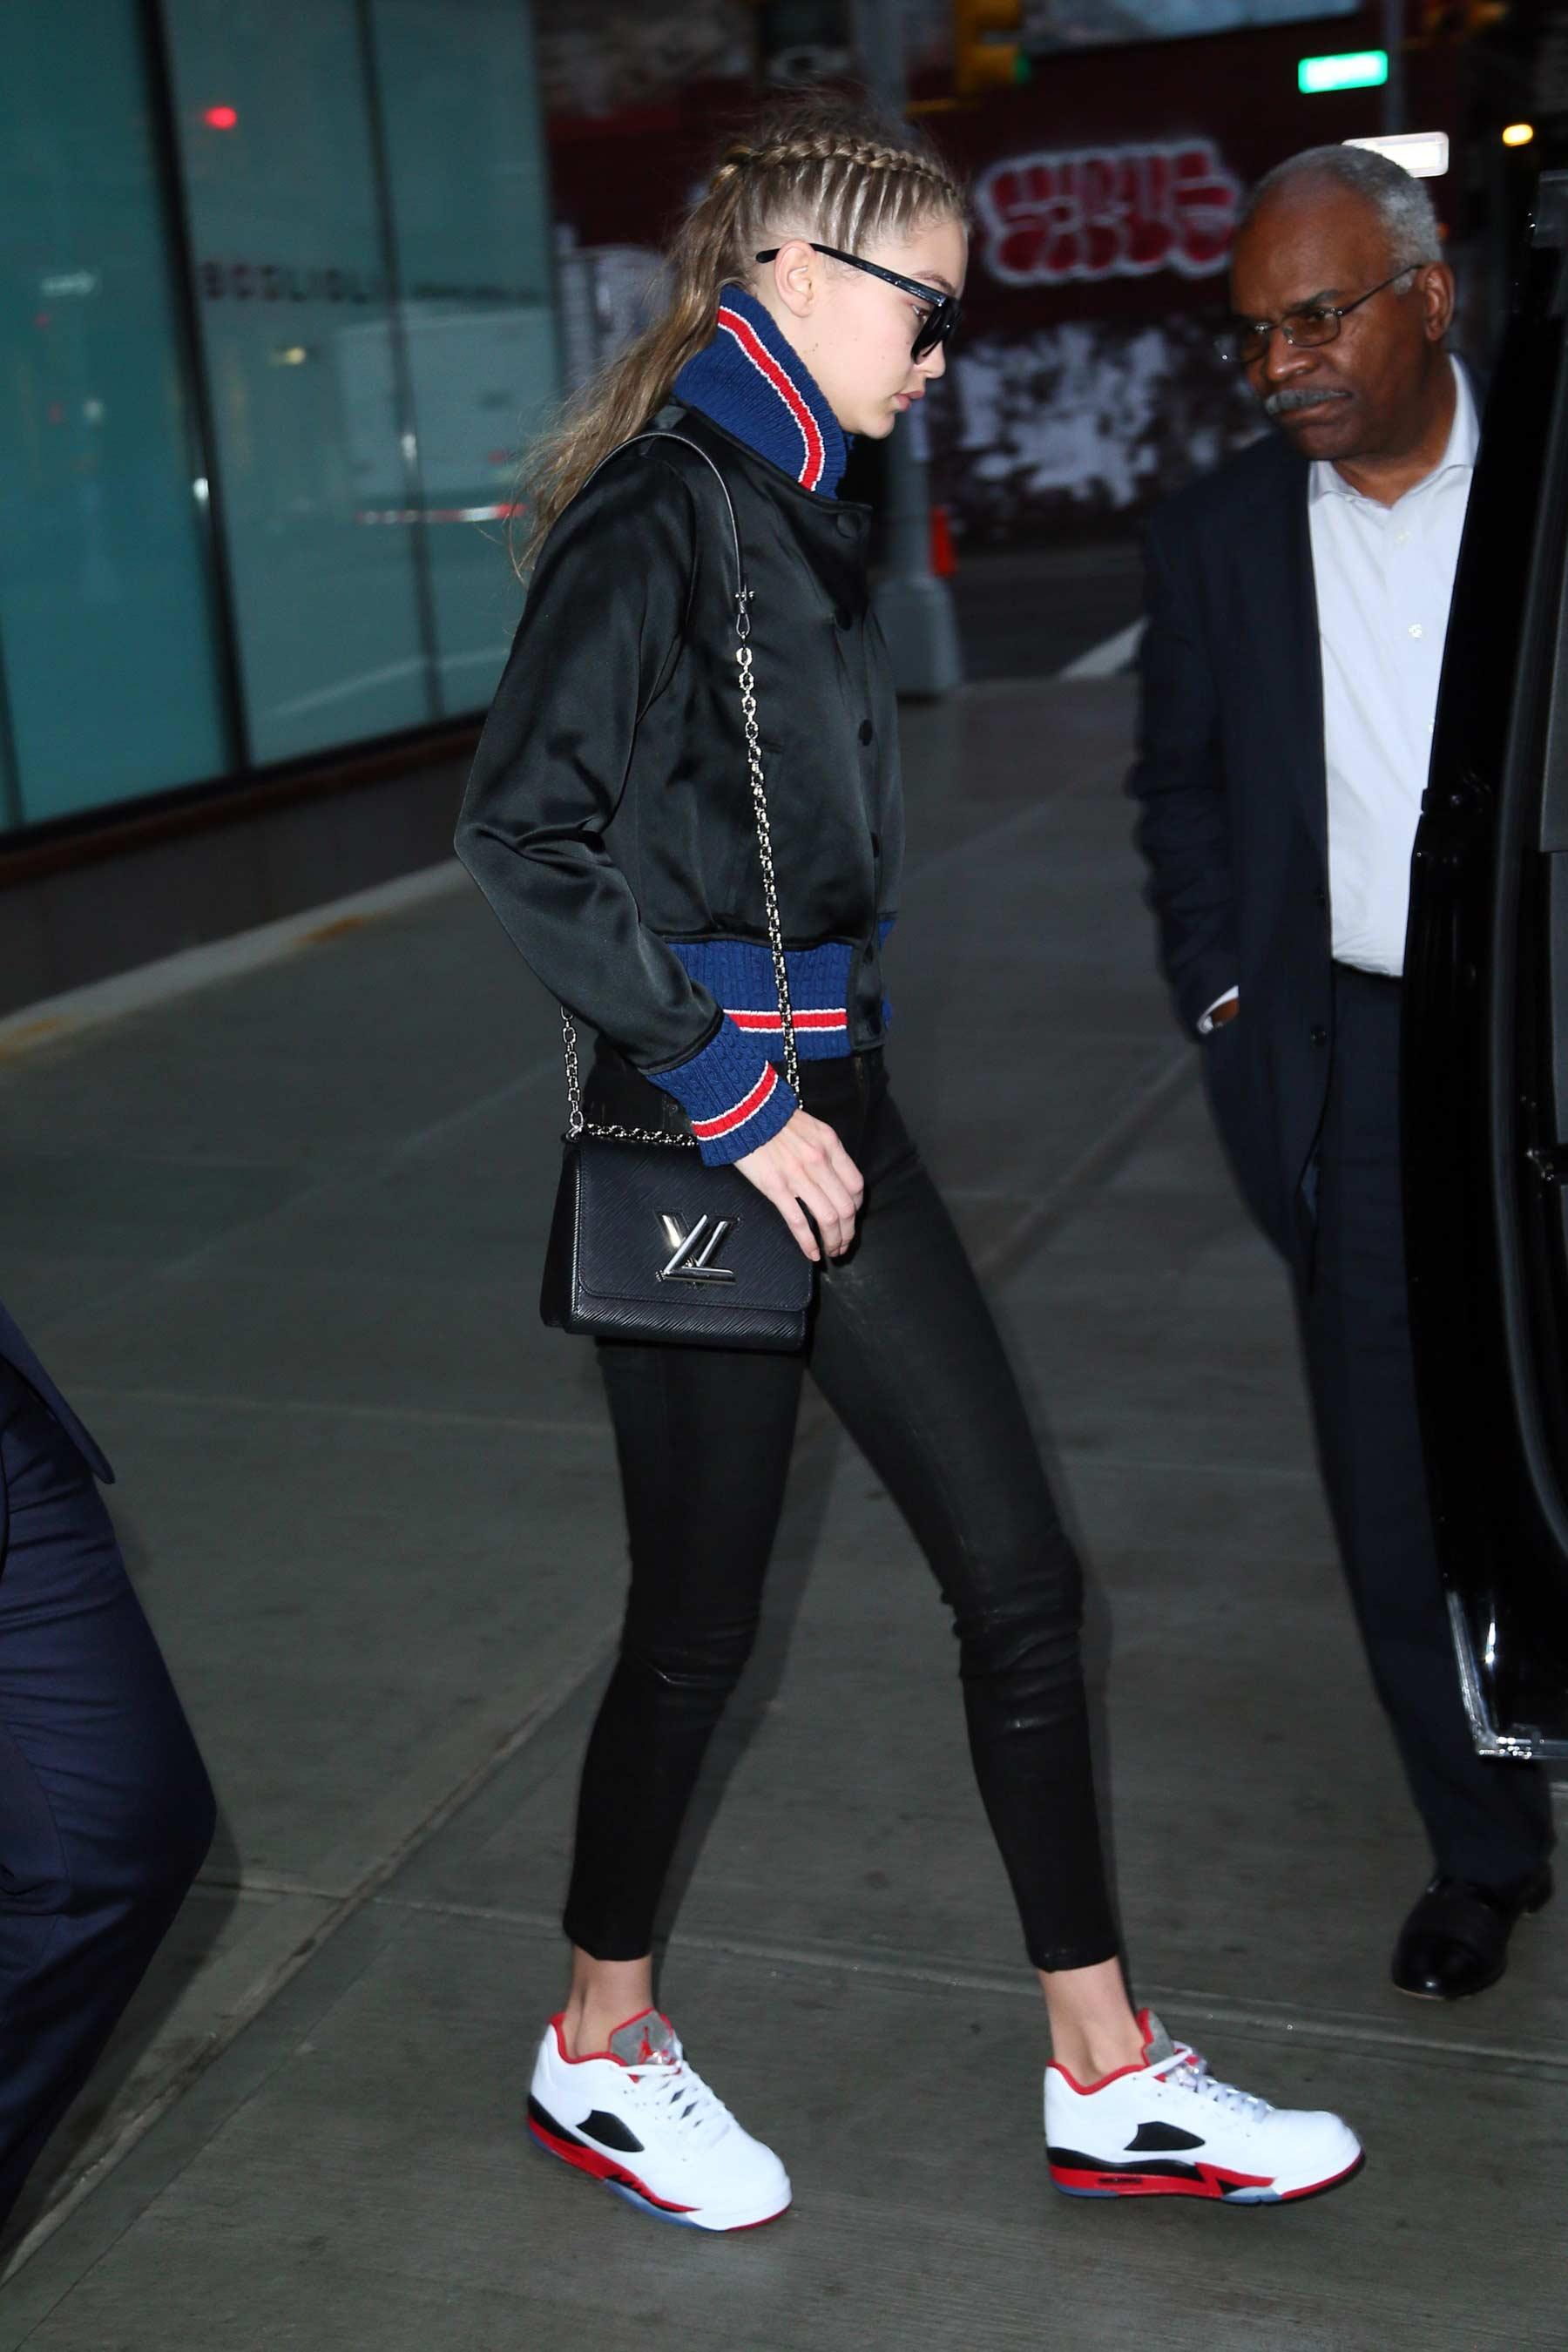 Gigi Hadid heading to the gym in New York City